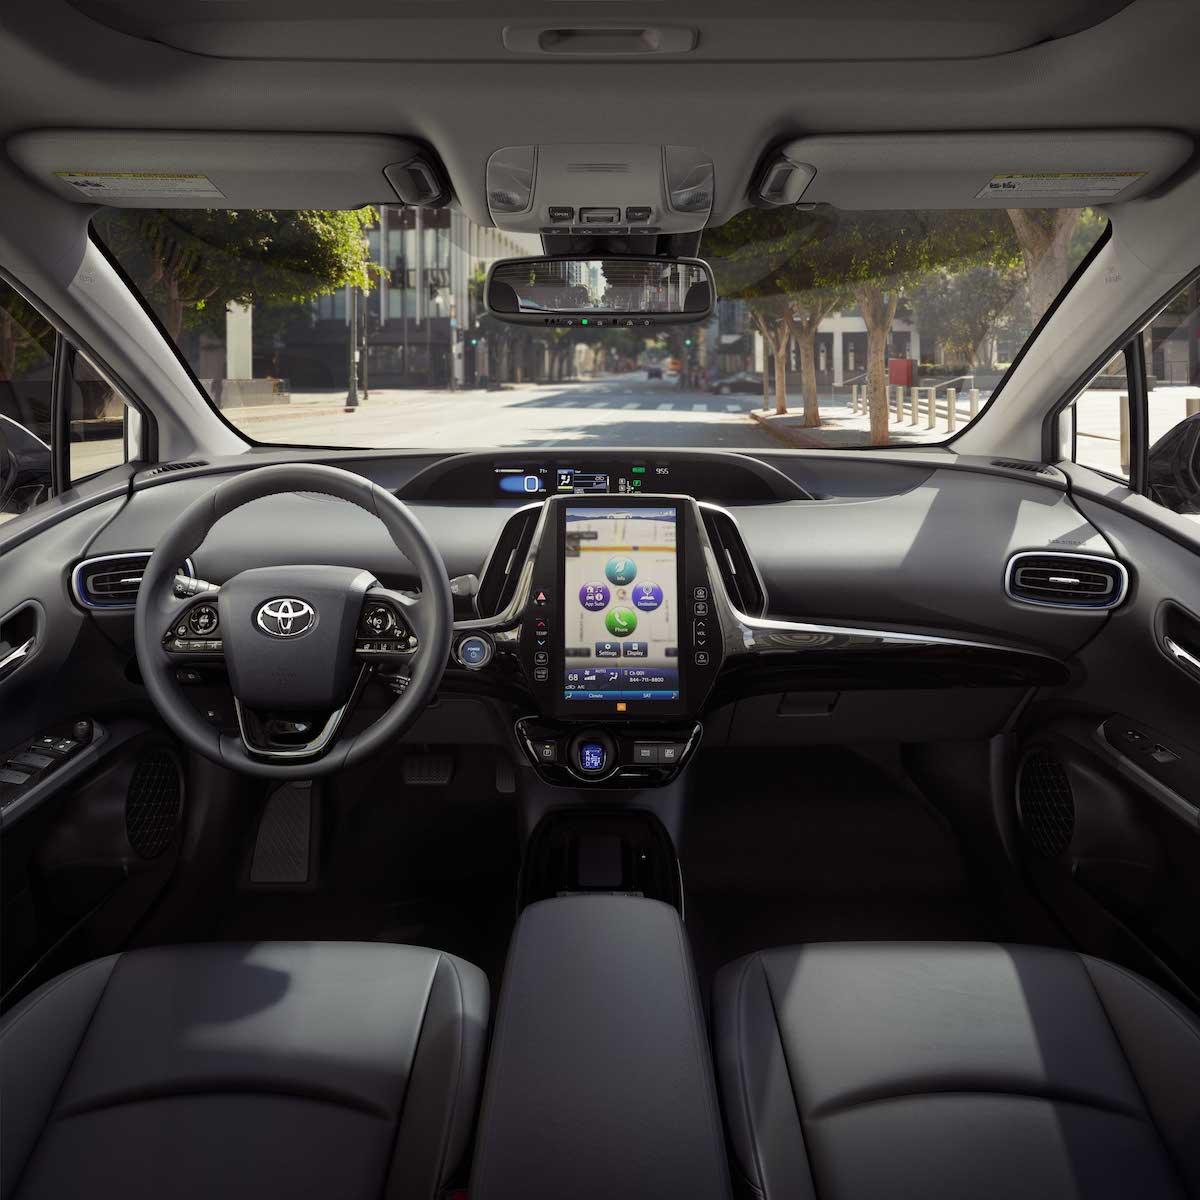 2019_Toyota_Prius_Limited_08_875AD11F84E37AC85F65119FEC1E5047C3475A5A.jpg